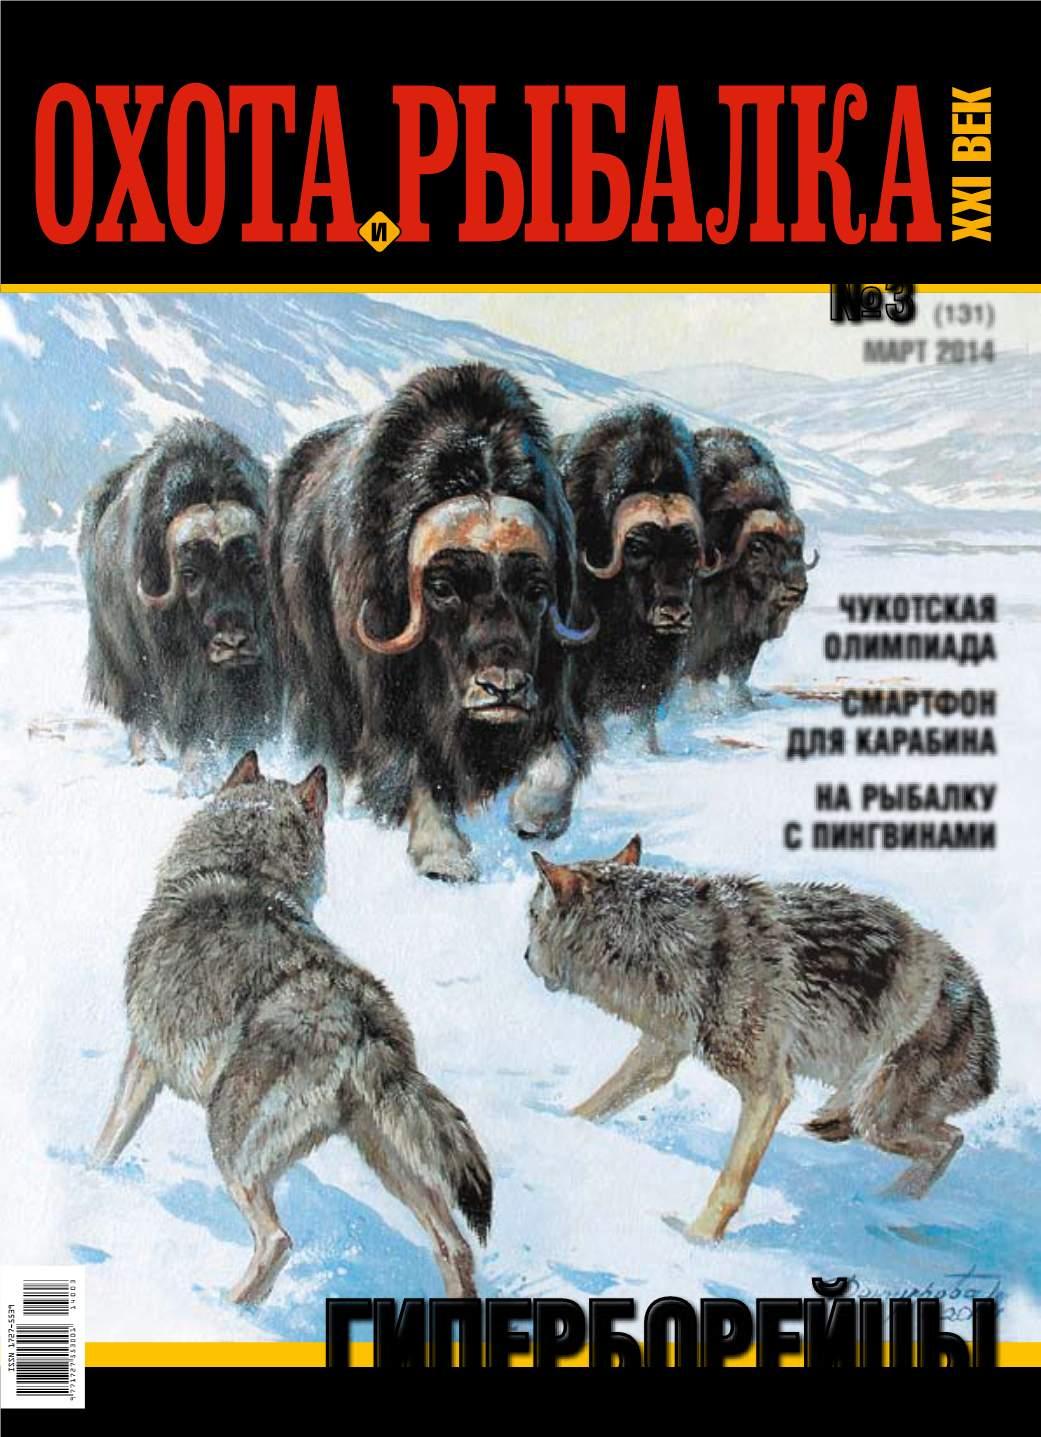 куплю журналы охота и рыбалка 21 век